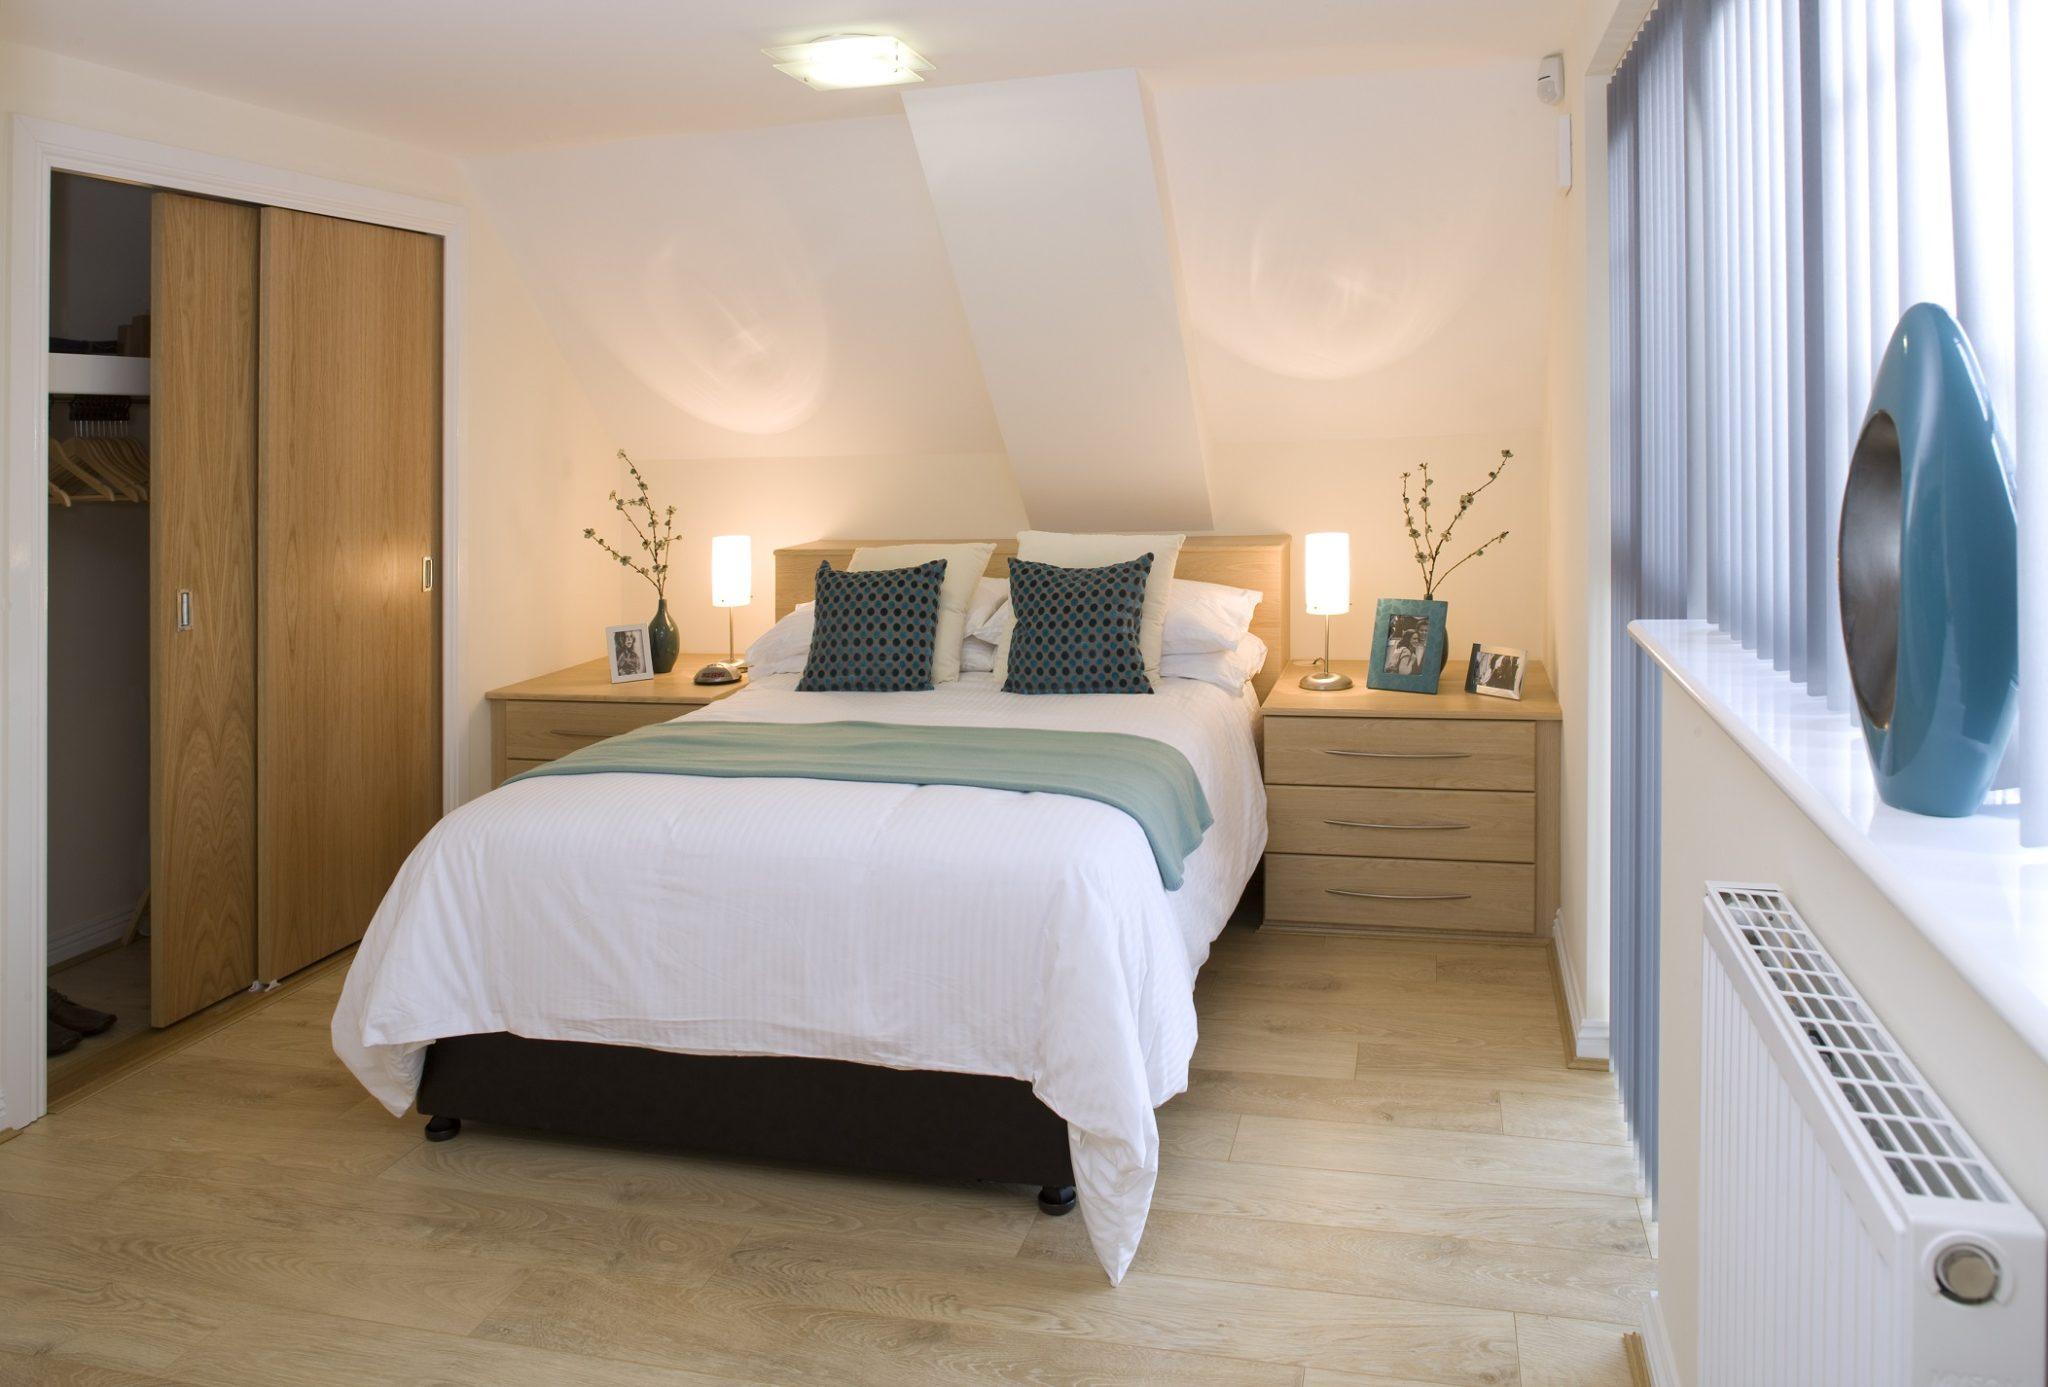 Cliddesden-Place-Short-Stay-Apartments-Basingstoke-UK-Bedroom-Wood-Floor